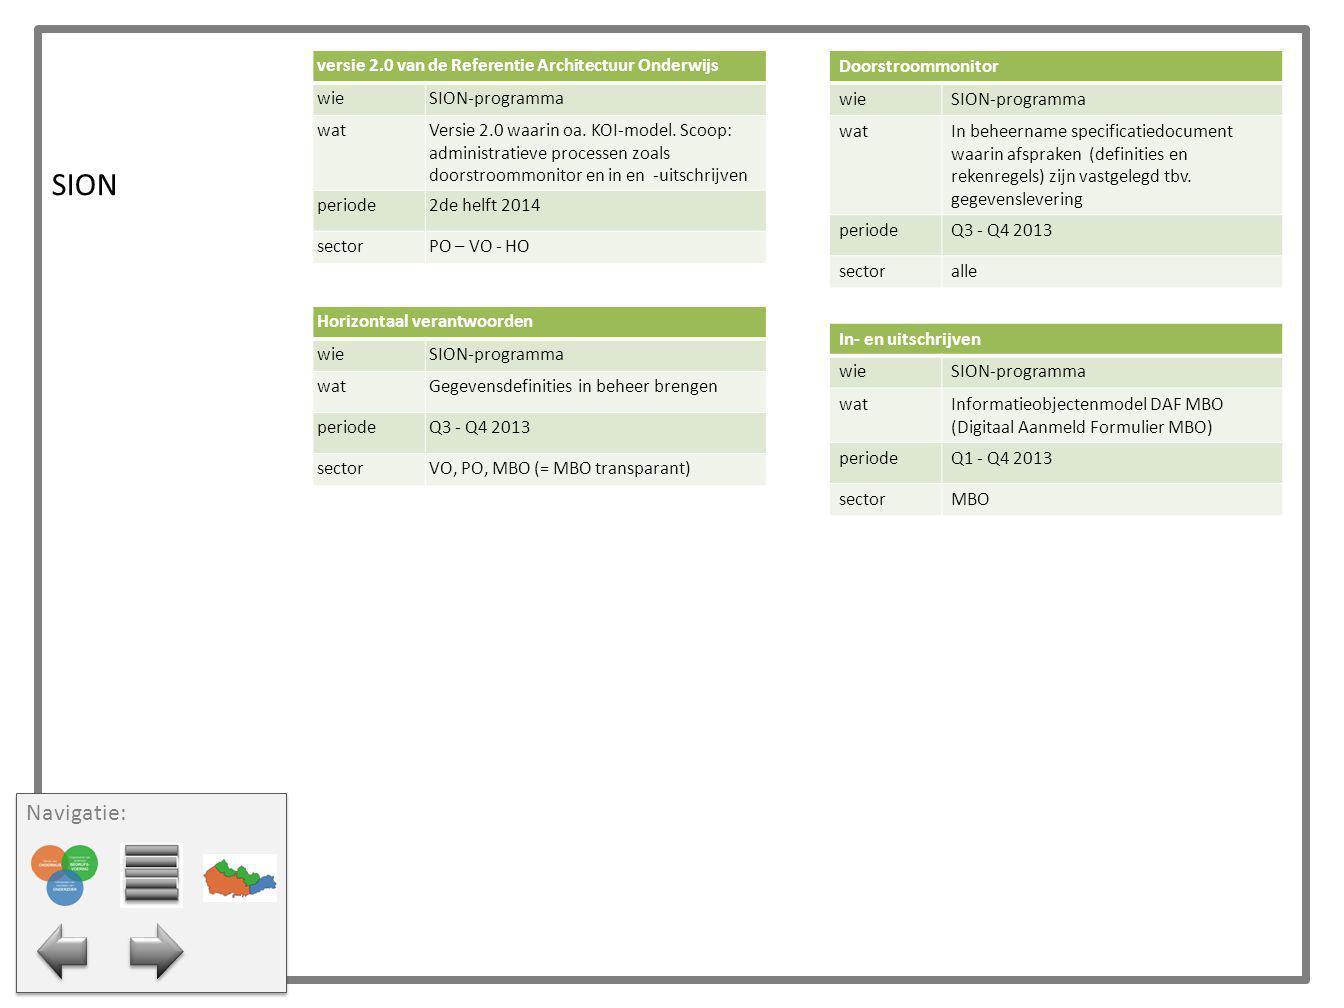 SION Horizontaal verantwoorden wieSION-programma watGegevensdefinities in beheer brengen periodeQ3 - Q4 2013 sectorVO, PO, MBO (= MBO transparant) In-